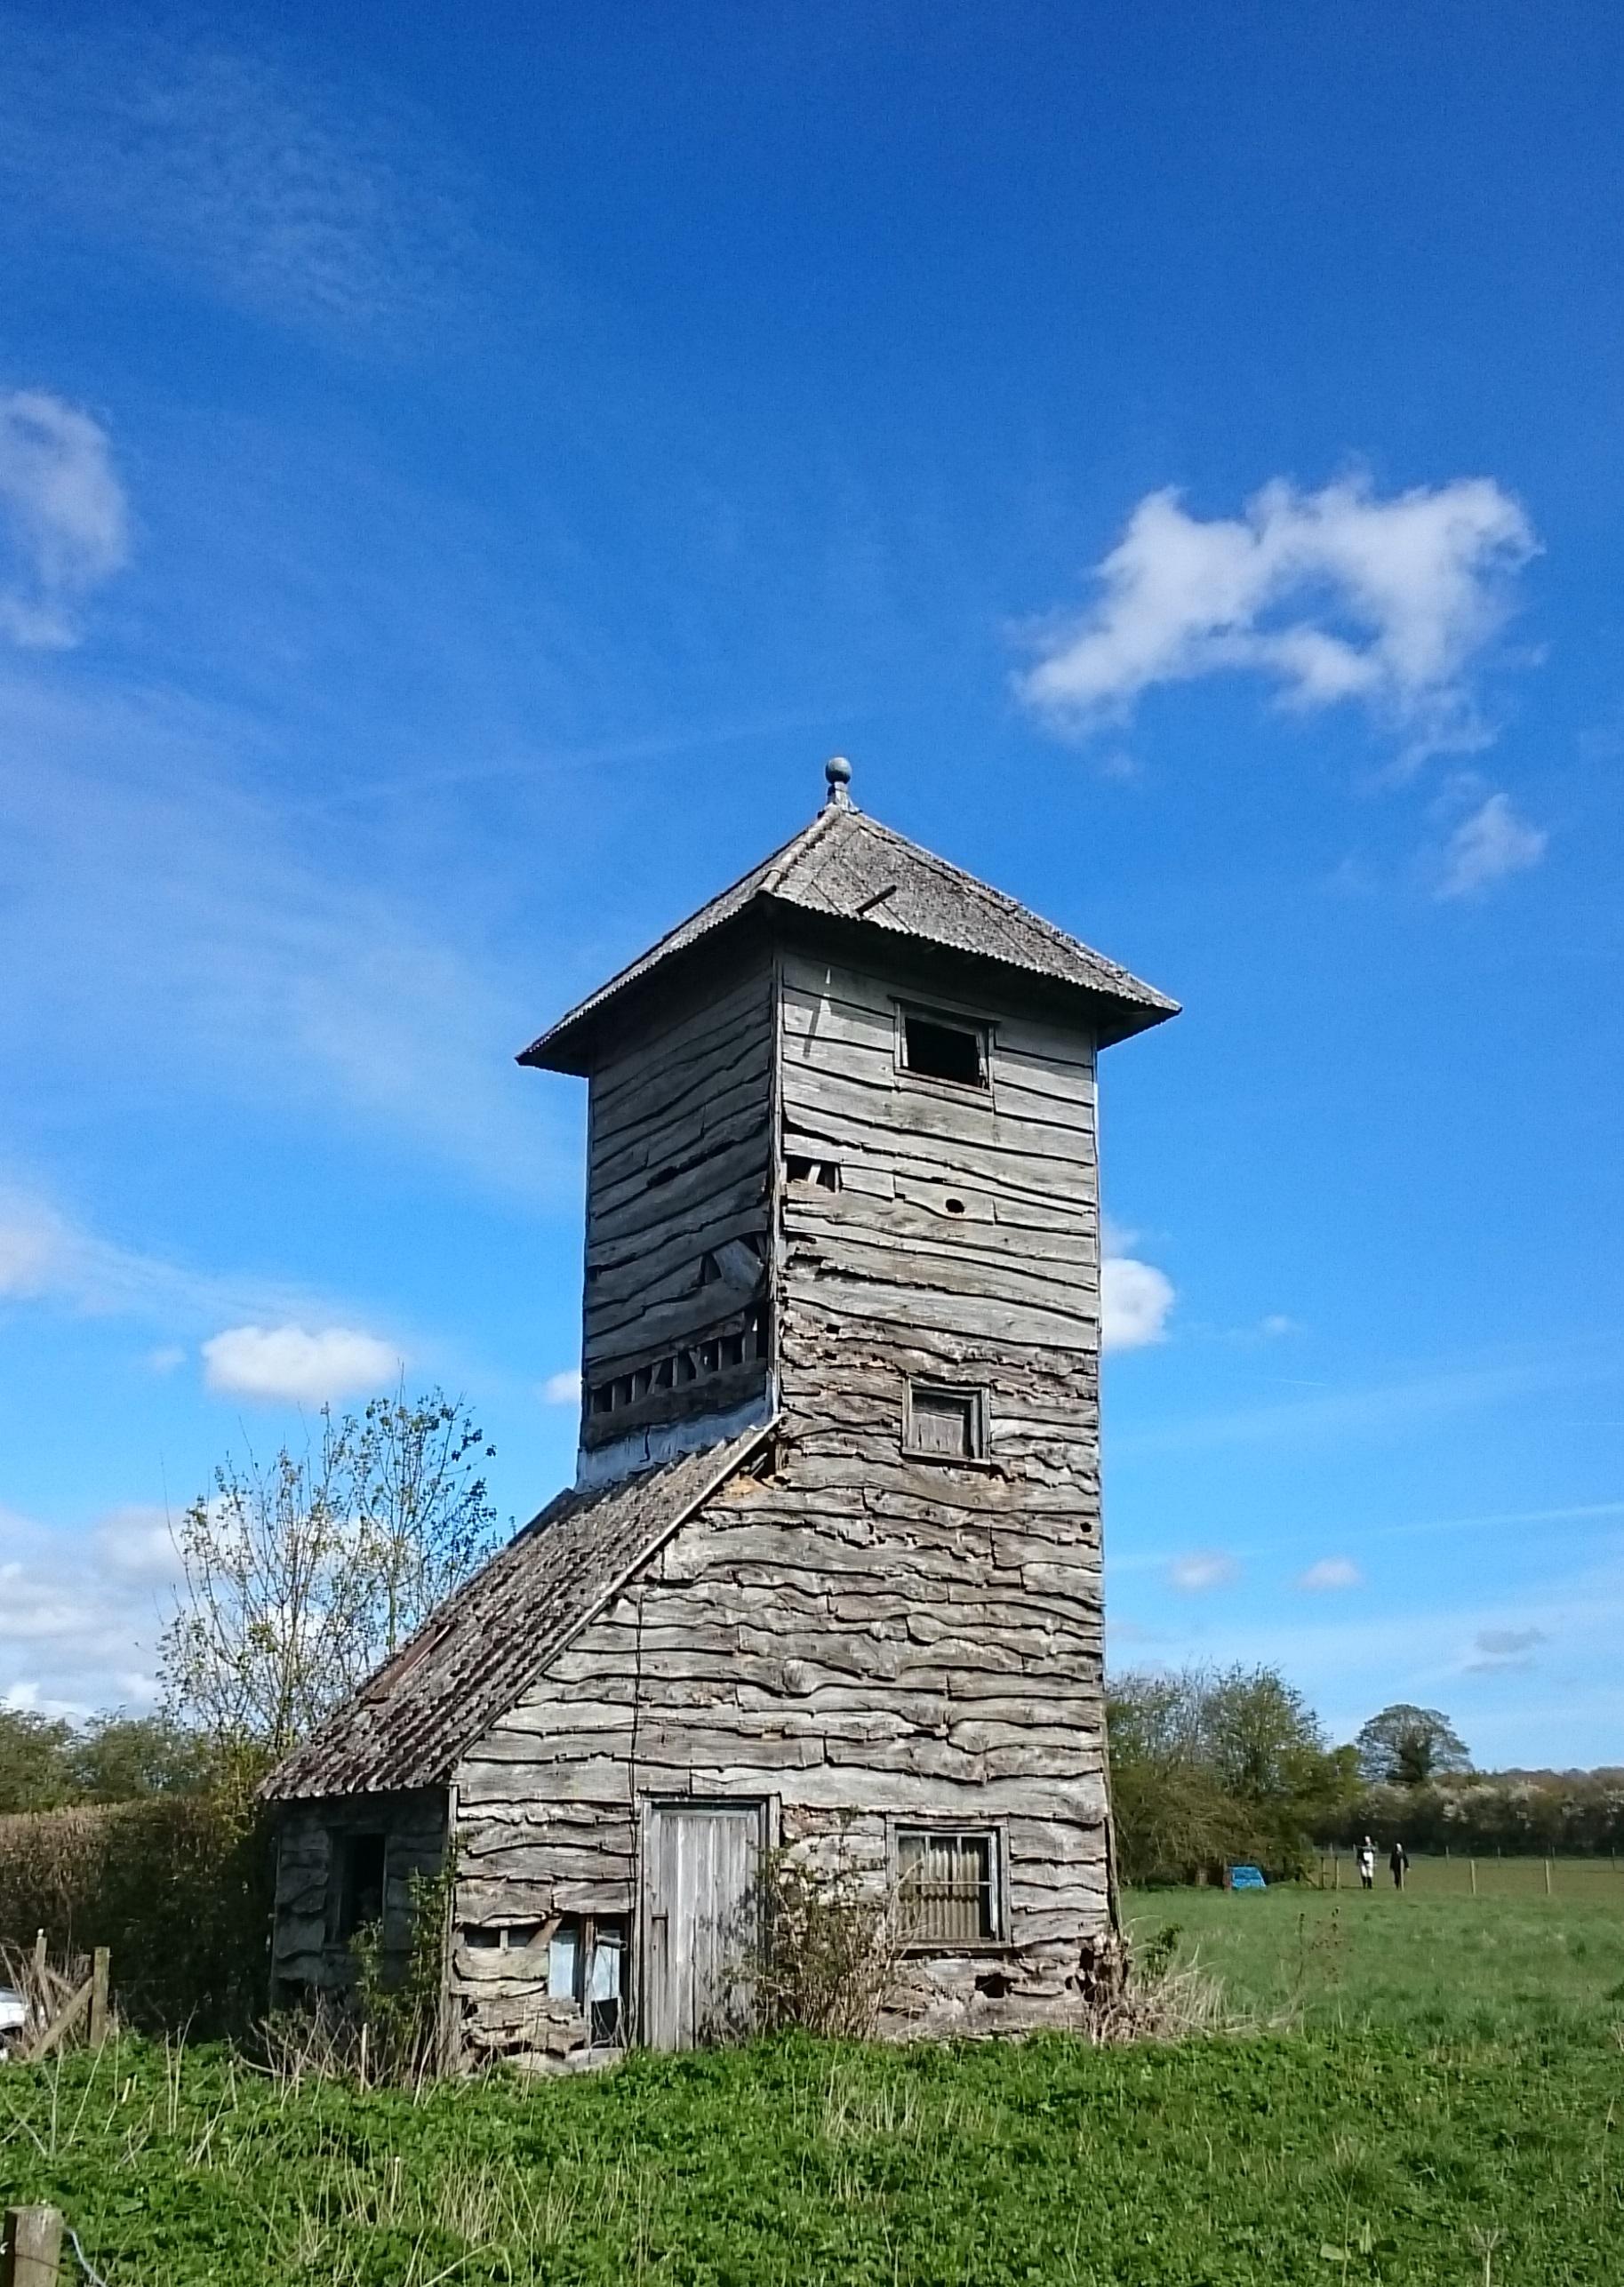 Water Tower Goodworth Clatford